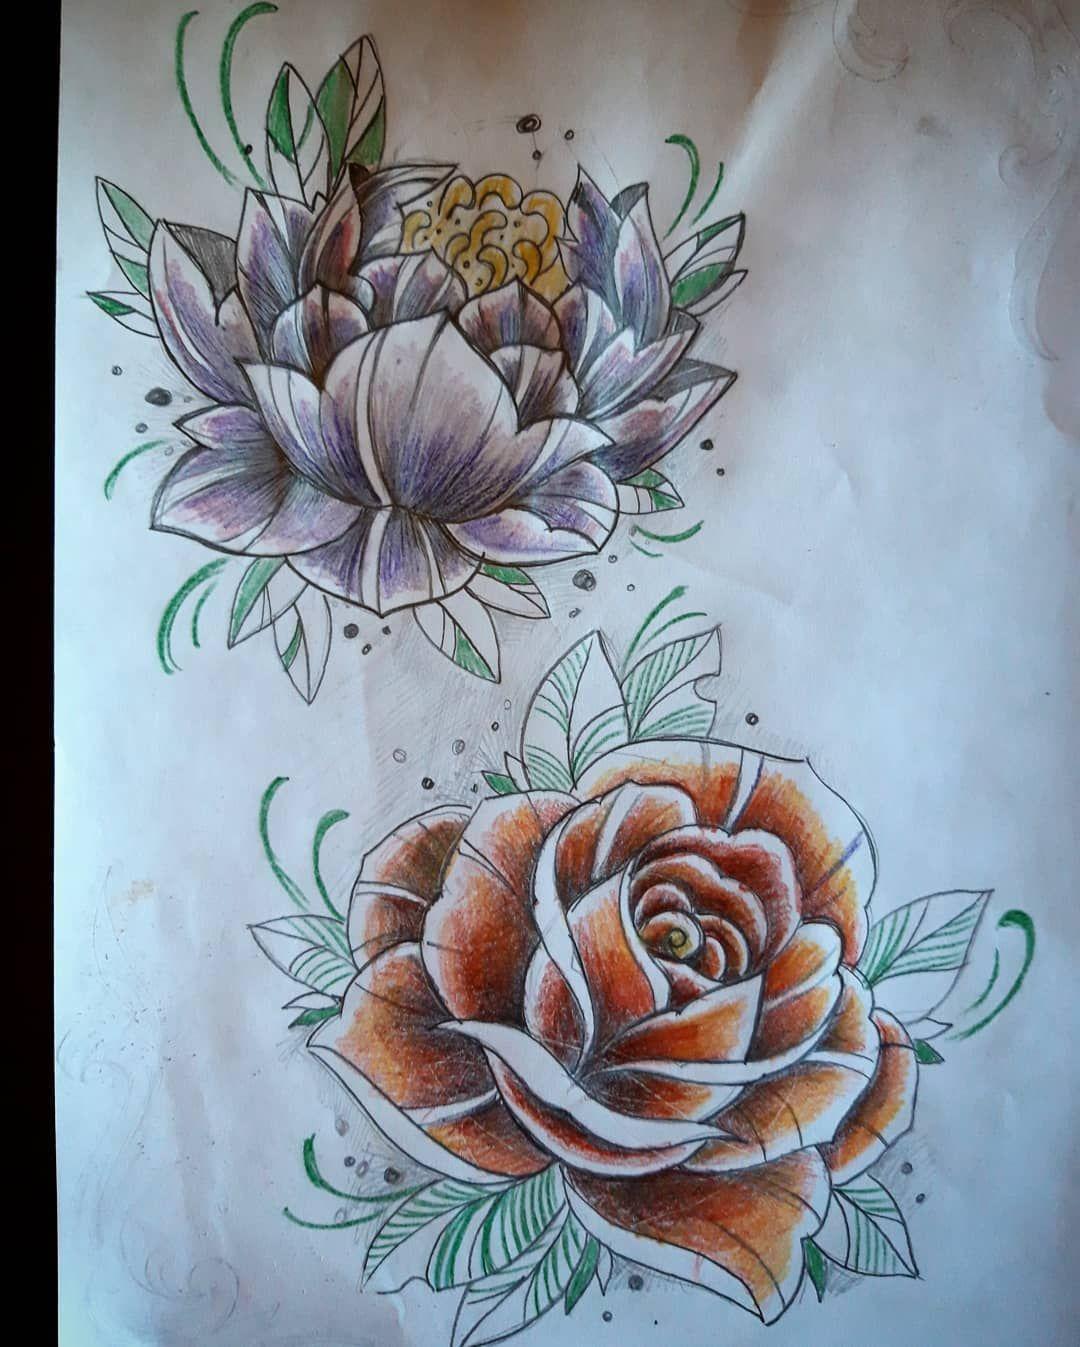 #tattoosketch #rosetattoo #flowerstattoo #flowerstattoosketch #pencildraw #drawing #tattoodrawing #rosatatuata #peoniatattoo #genovatatuatore #tatuatoregenova #zenatattoo #tattoostudiodanilo